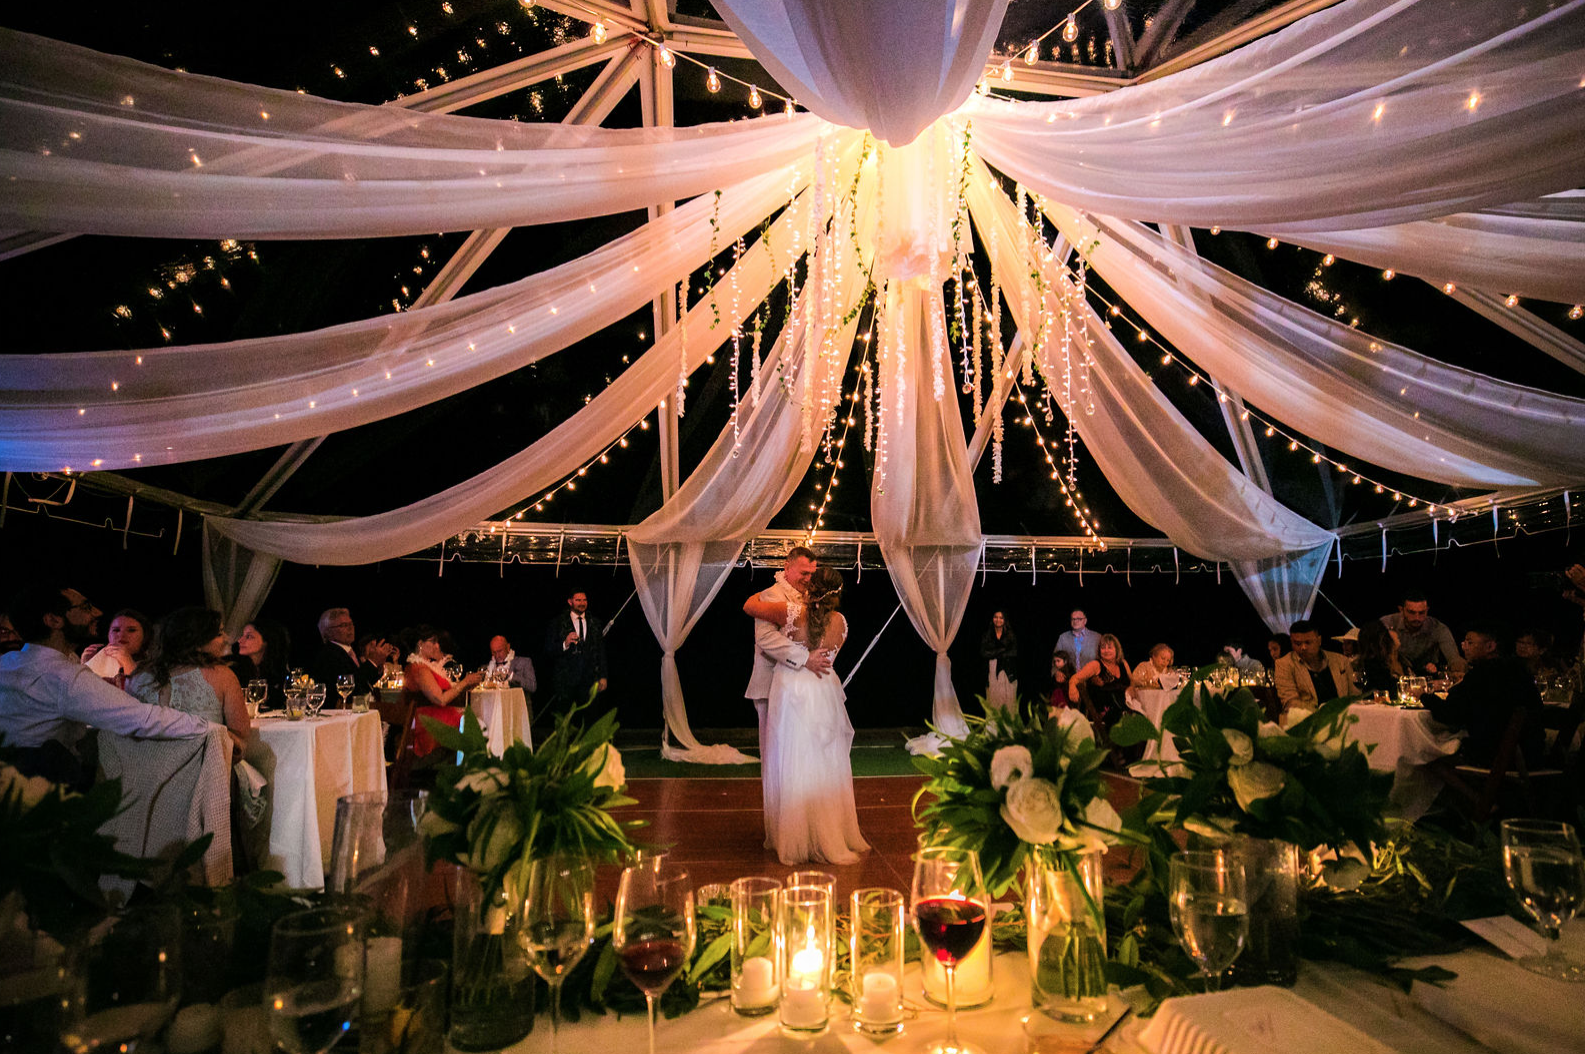 Tent Enhancements Cluster Lights Above The Dance Floor Orchid